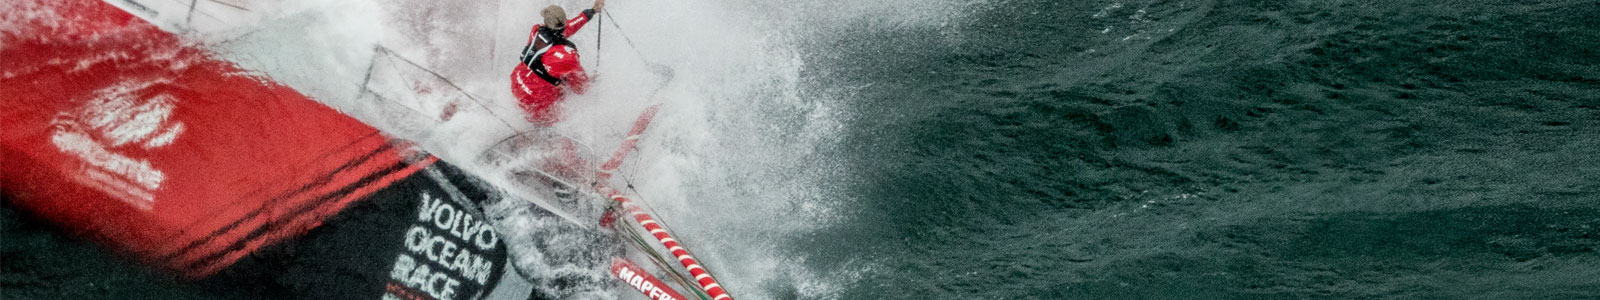 Seamaster 海洋宇宙600米腕表 - 系列